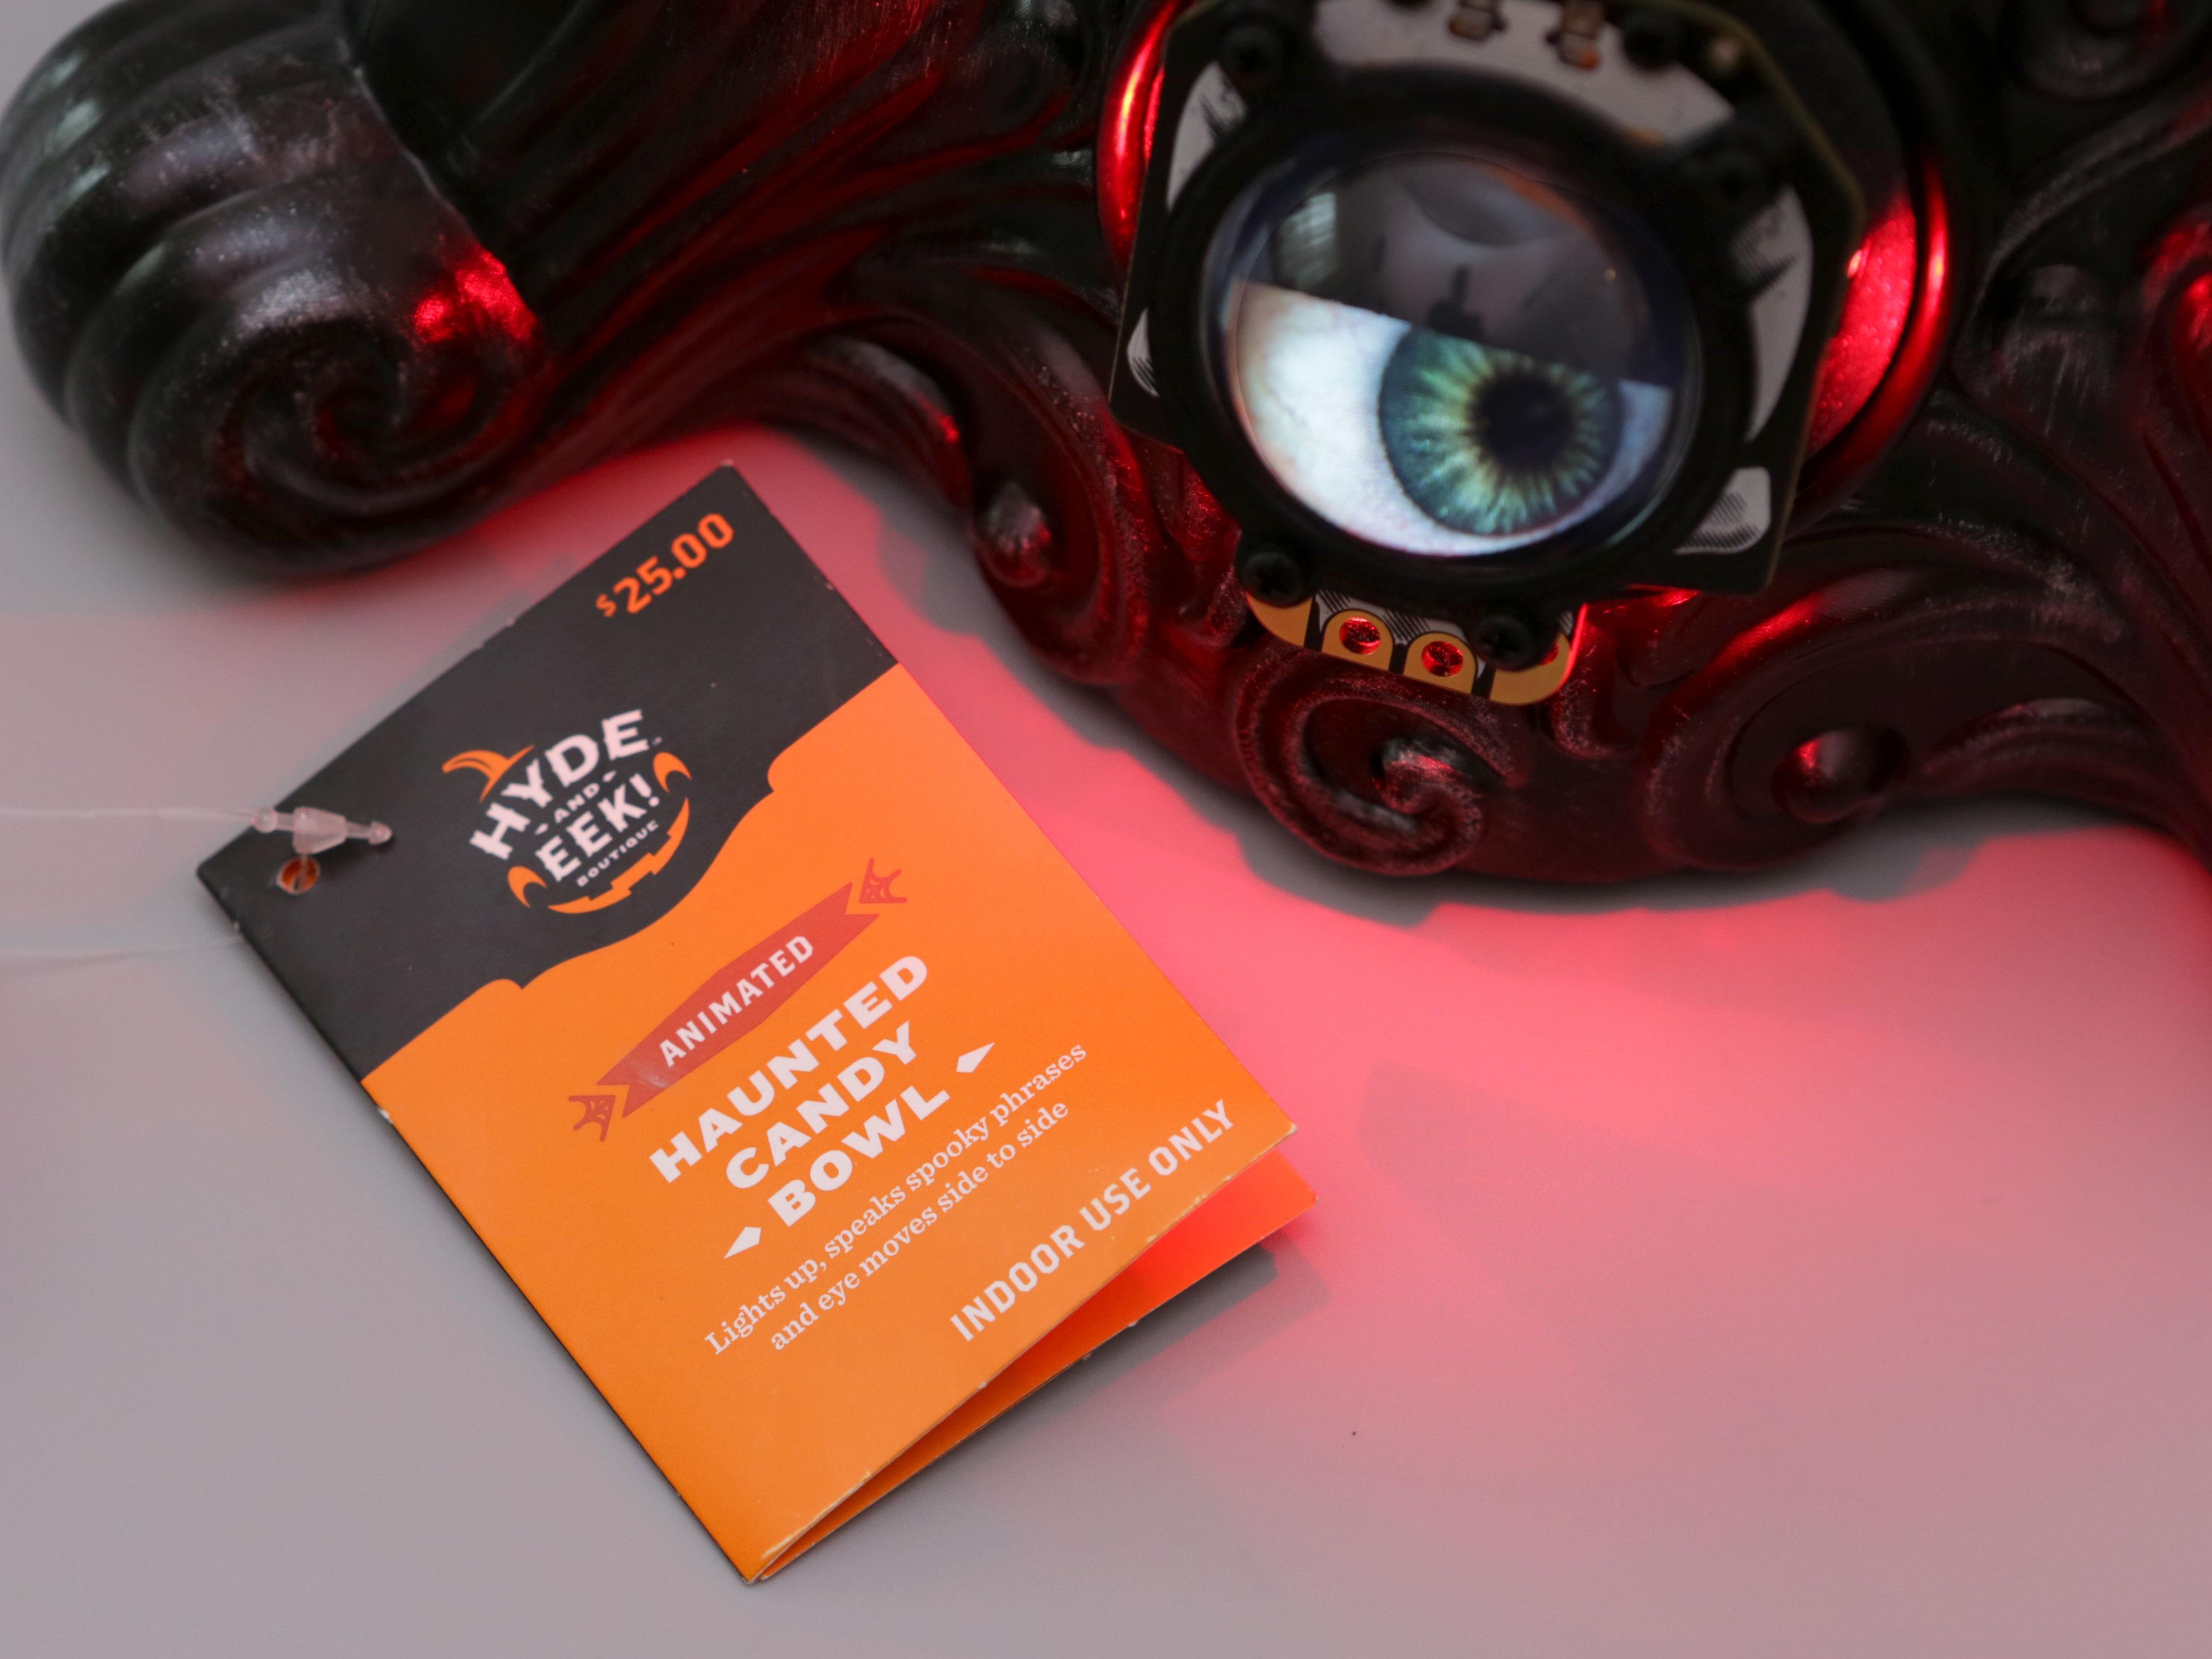 candybowl-tag.jpg Télécharger fichier STL gratuit Animated Eye Candy Bowl Upgrade (en anglais seulement) • Design imprimable en 3D, Adafruit